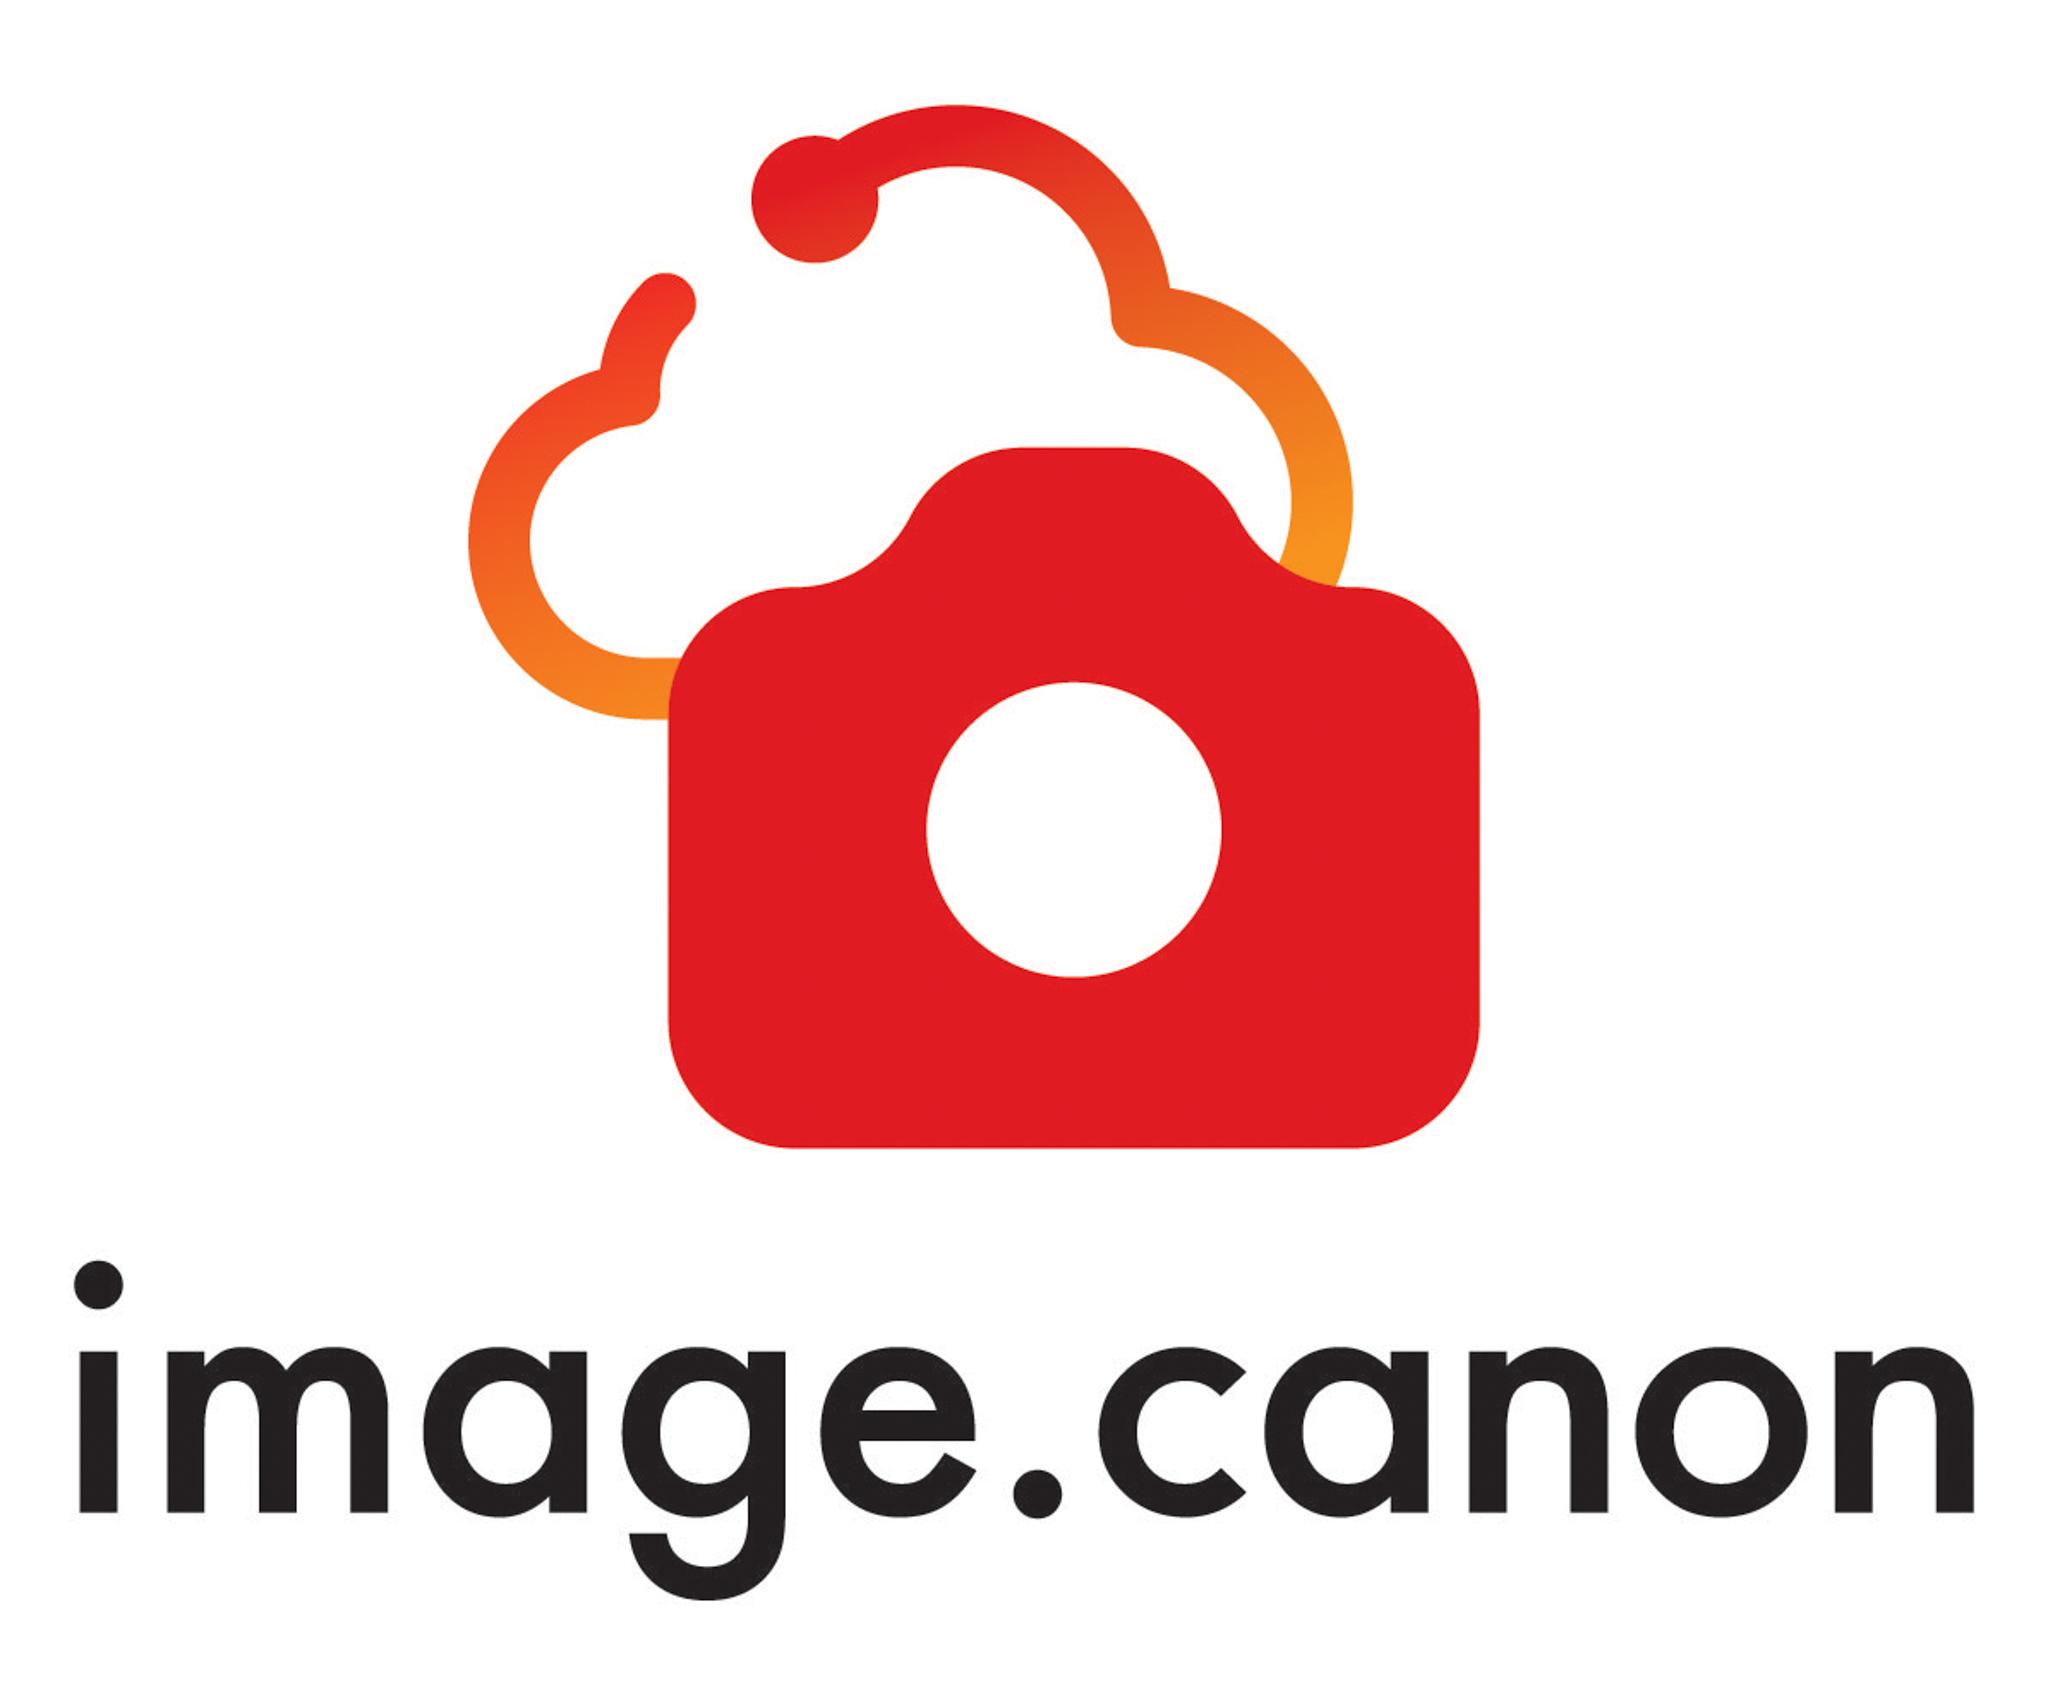 Adobe Lightroom image.canon